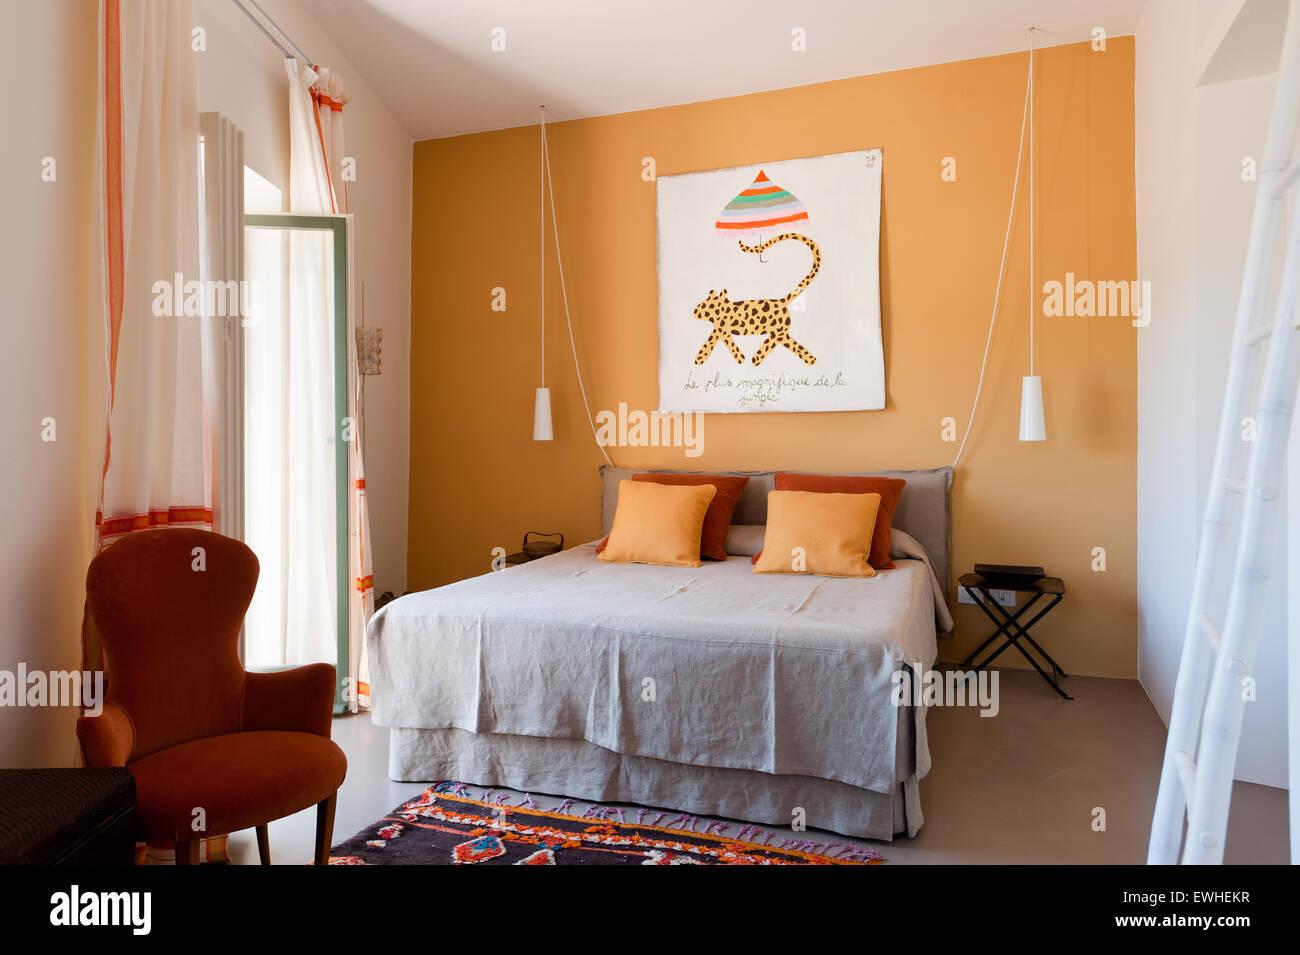 Italian Curtains Stock Photos & Italian Curtains Stock Images - Alamy